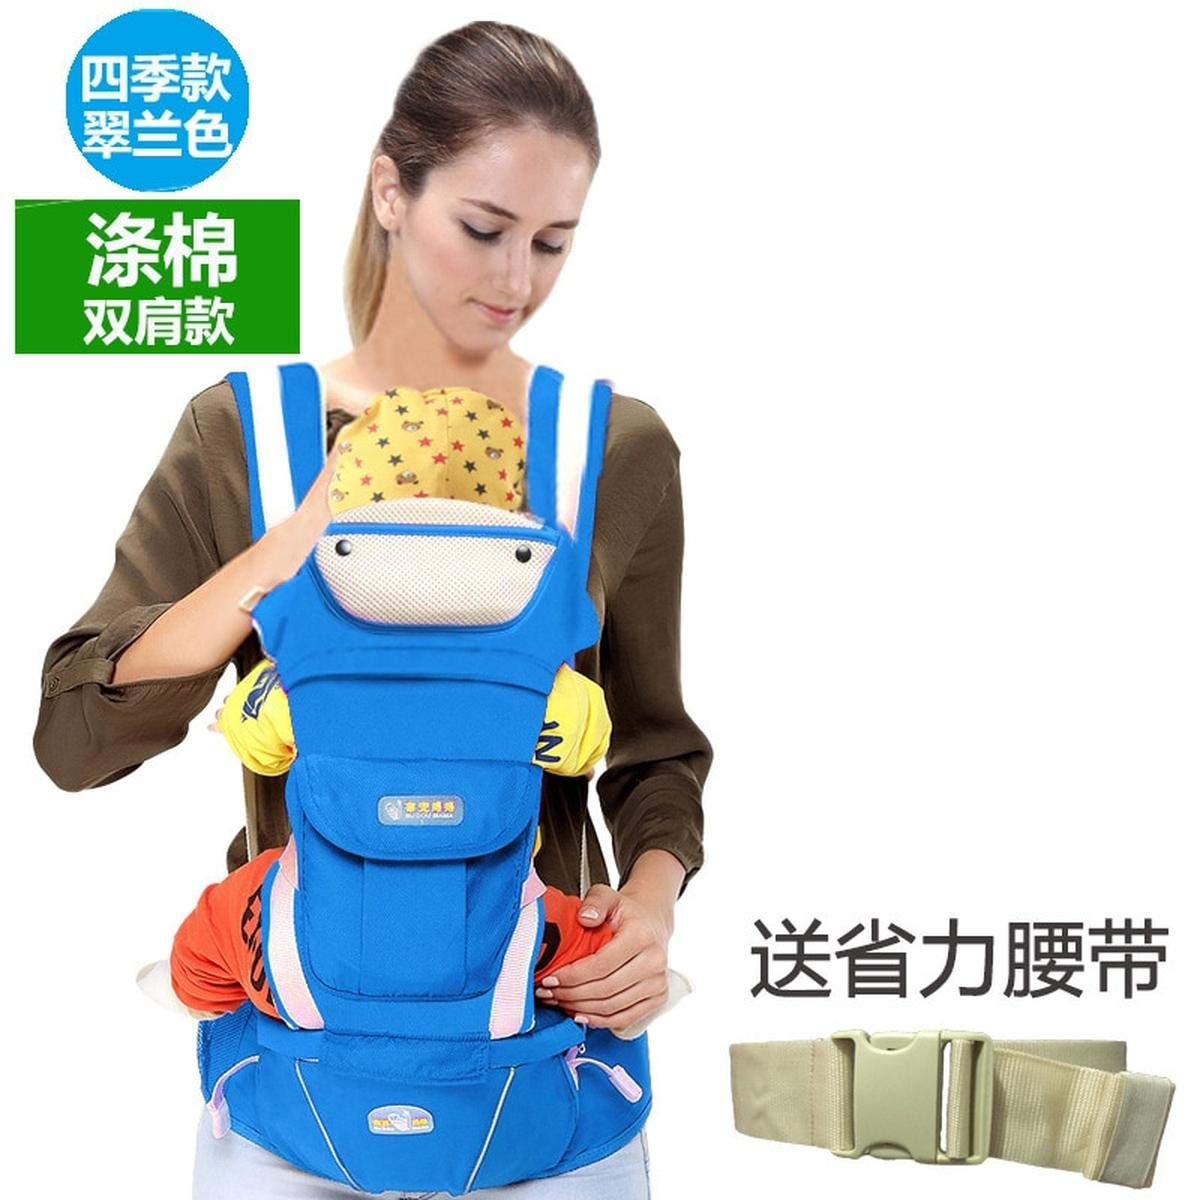 manduca toddler carrier